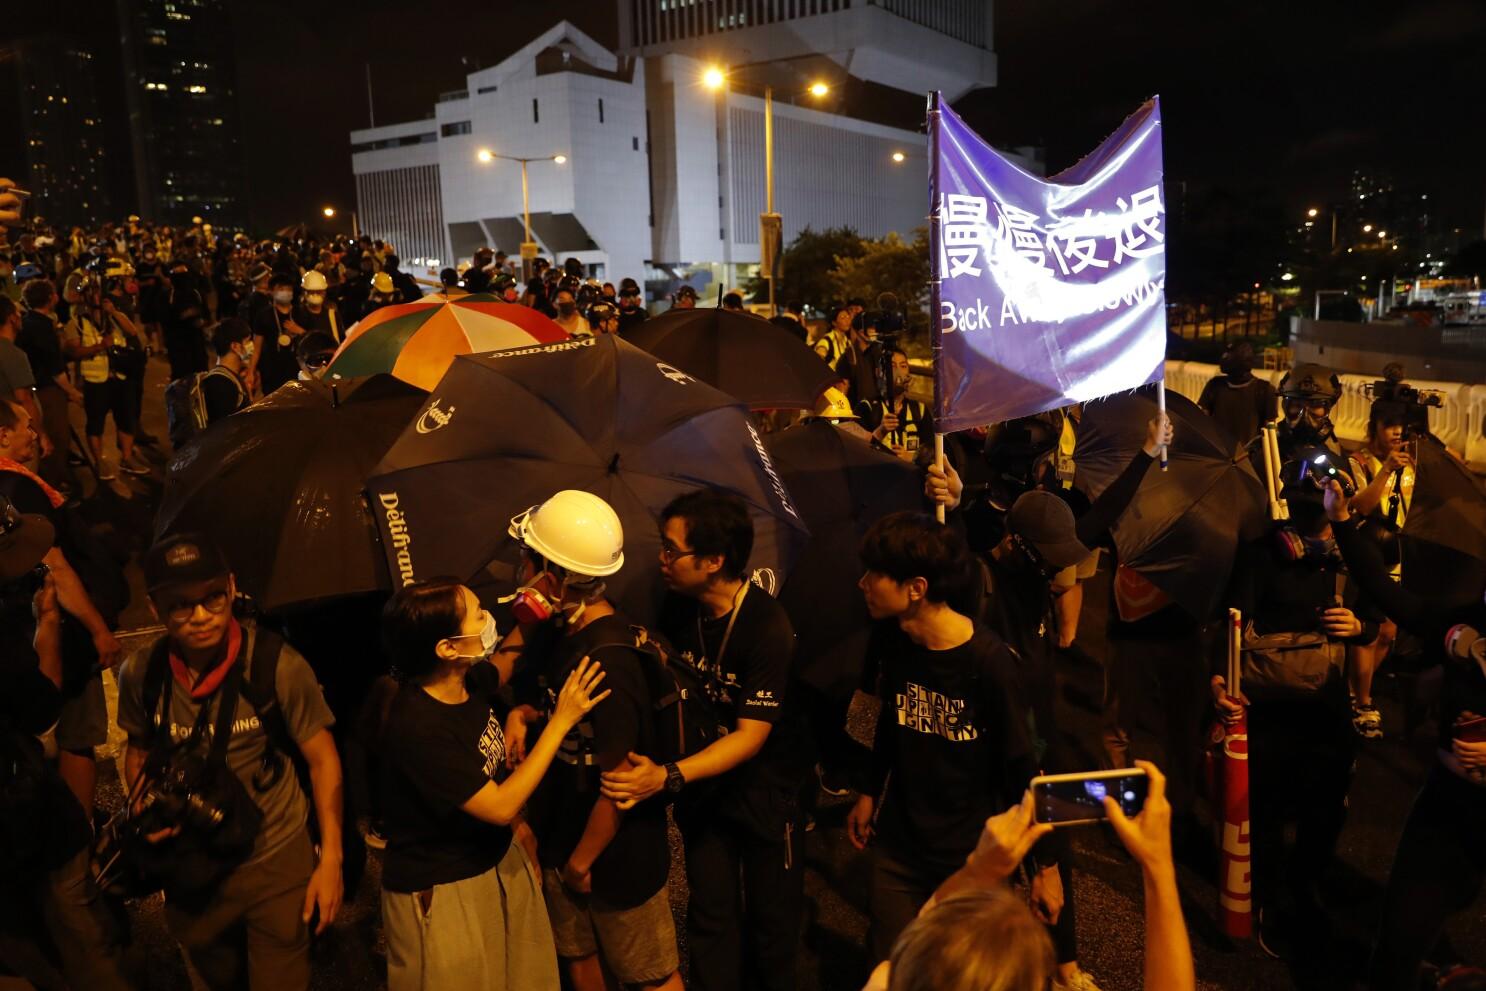 Facebook, Twitter accuse China of Hong Kong disinformation